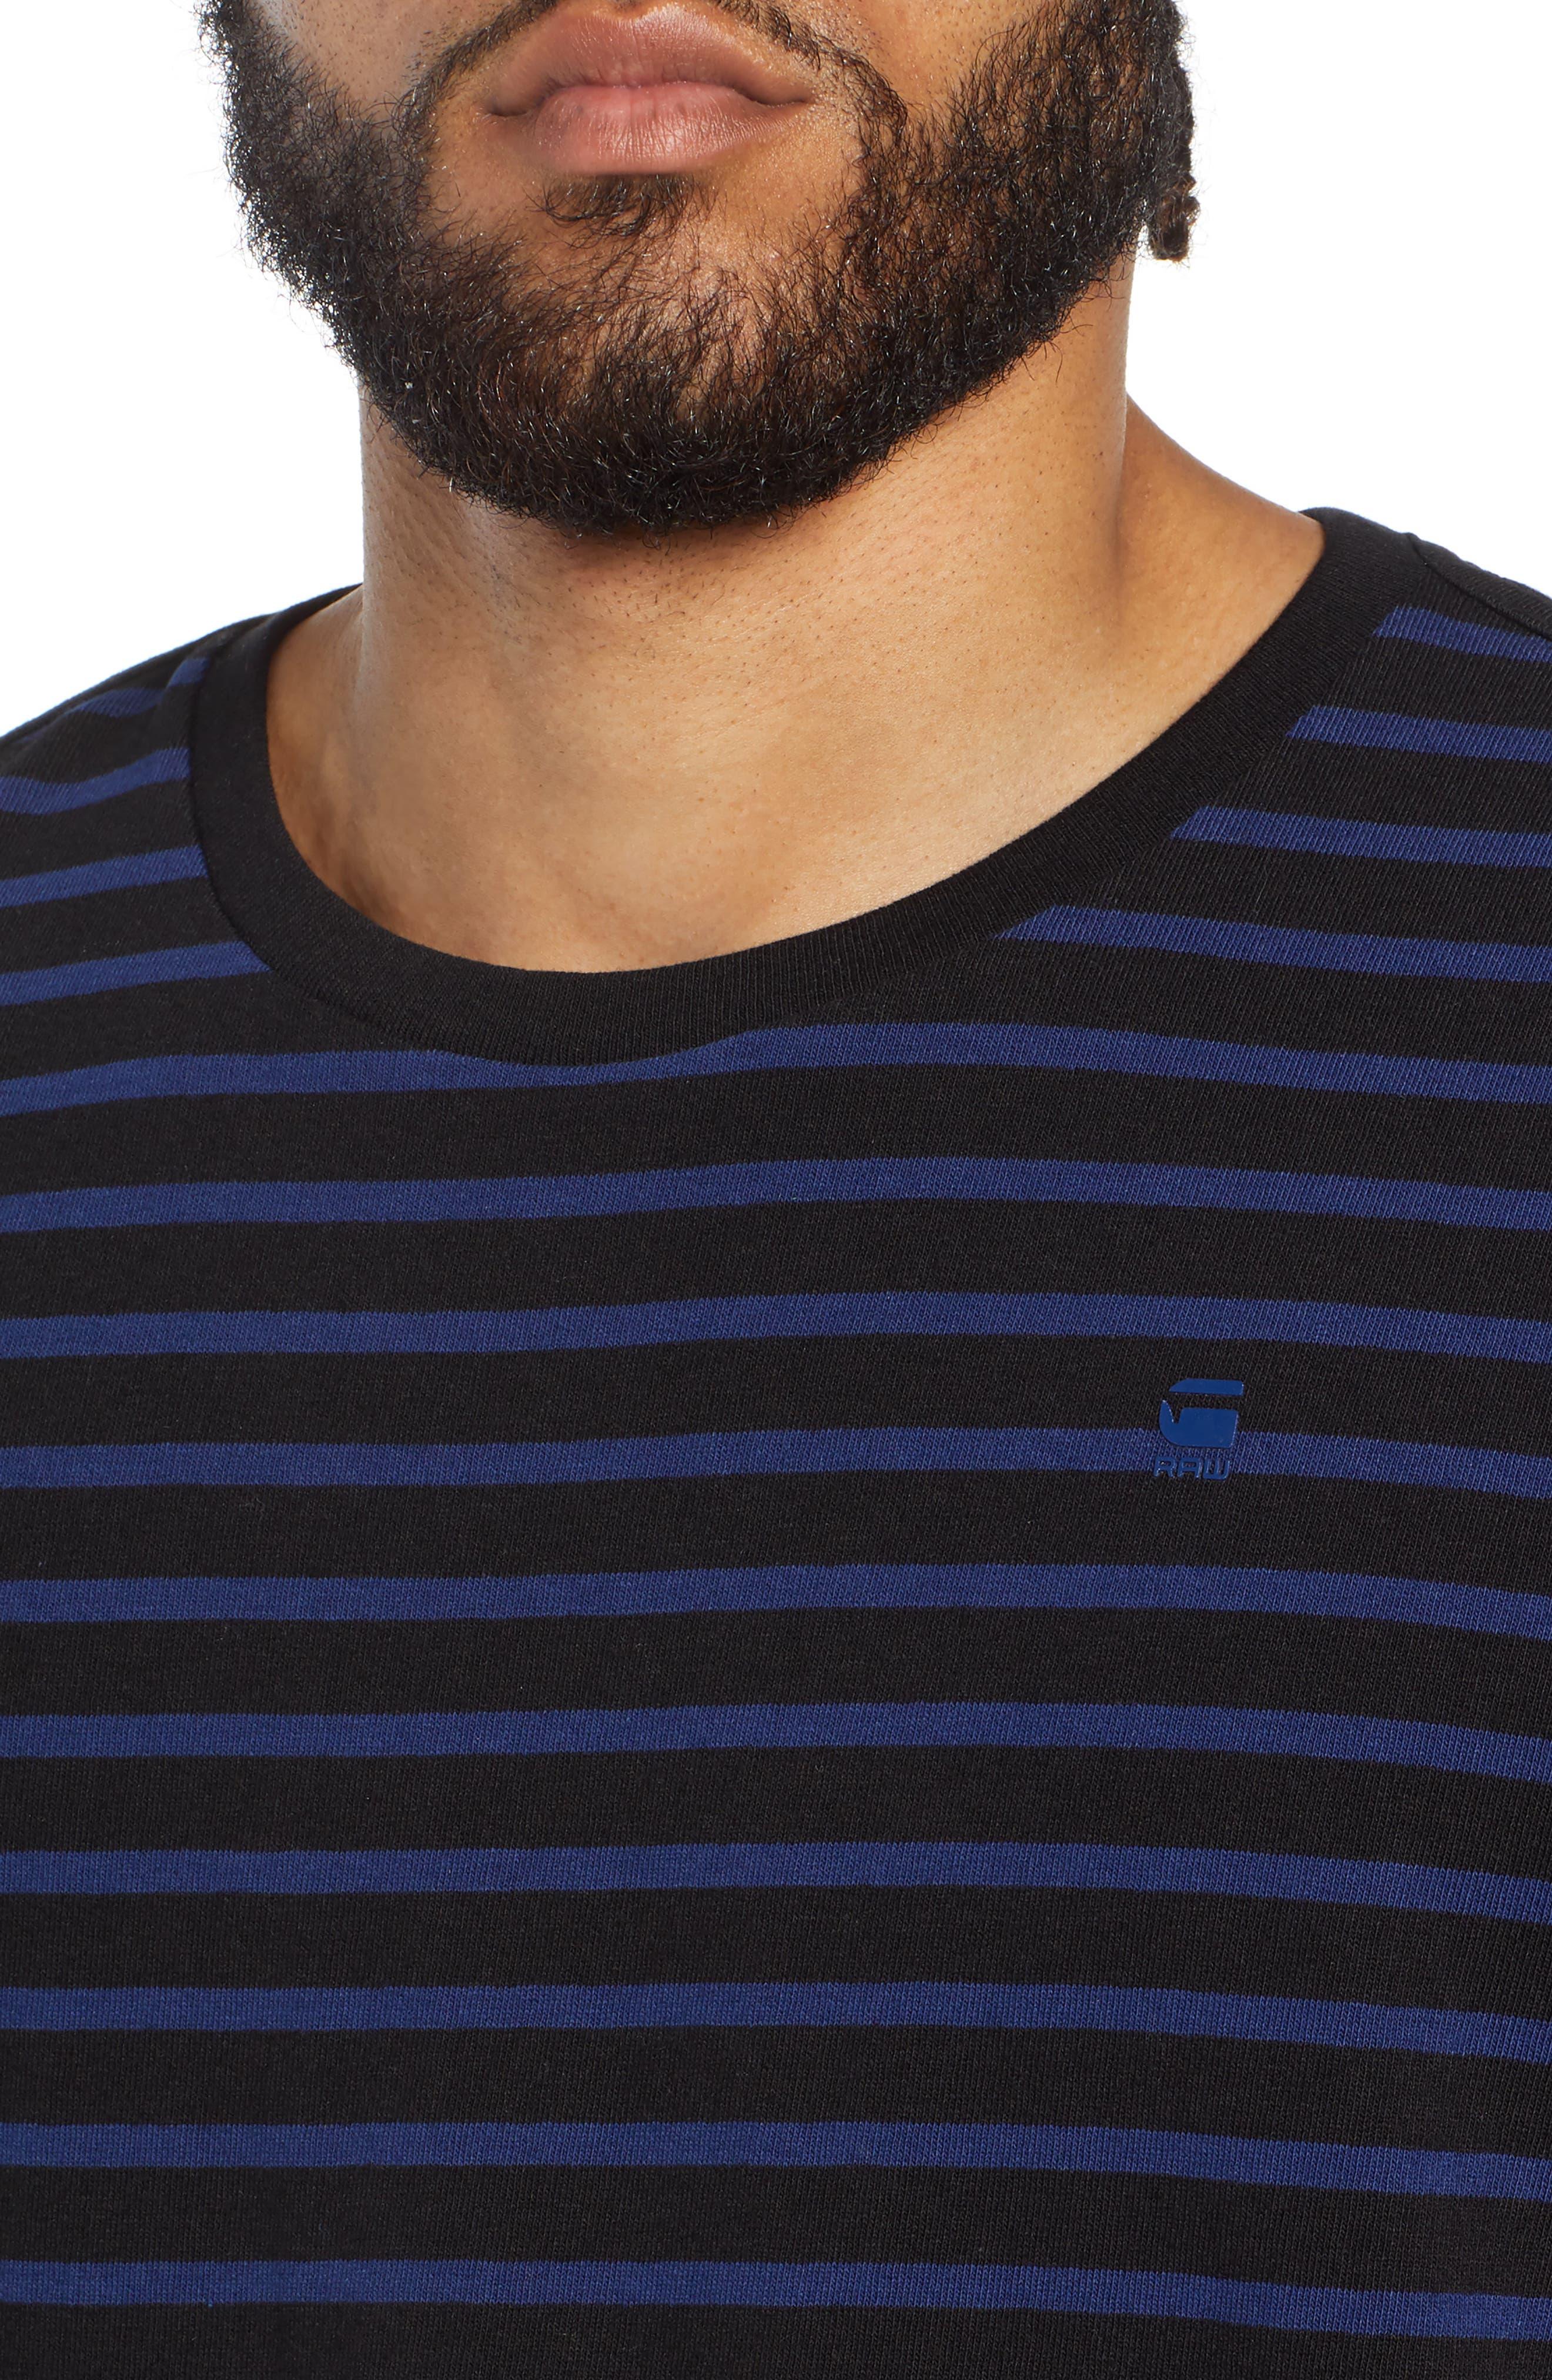 Starkon Stripe T-Shirt,                             Alternate thumbnail 4, color,                             DARK BLACK/ IMPERIAL BLUE